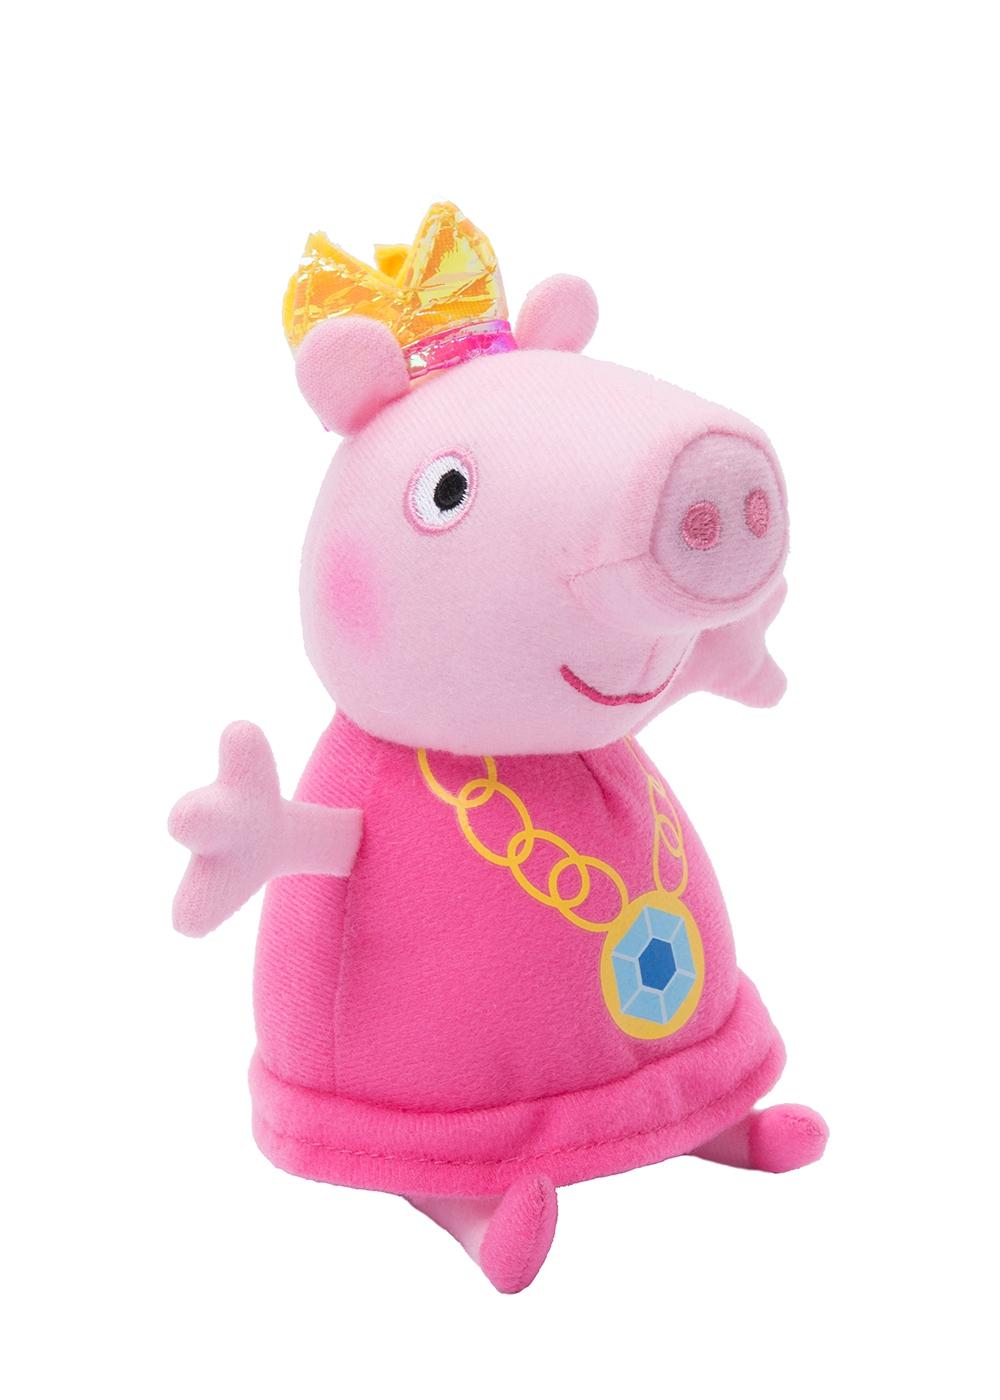 Peppa Pig Пеппа-принцесса 20 см росмэн мягкая игрушка пеппа с виноградом 20 см свинка пеппа